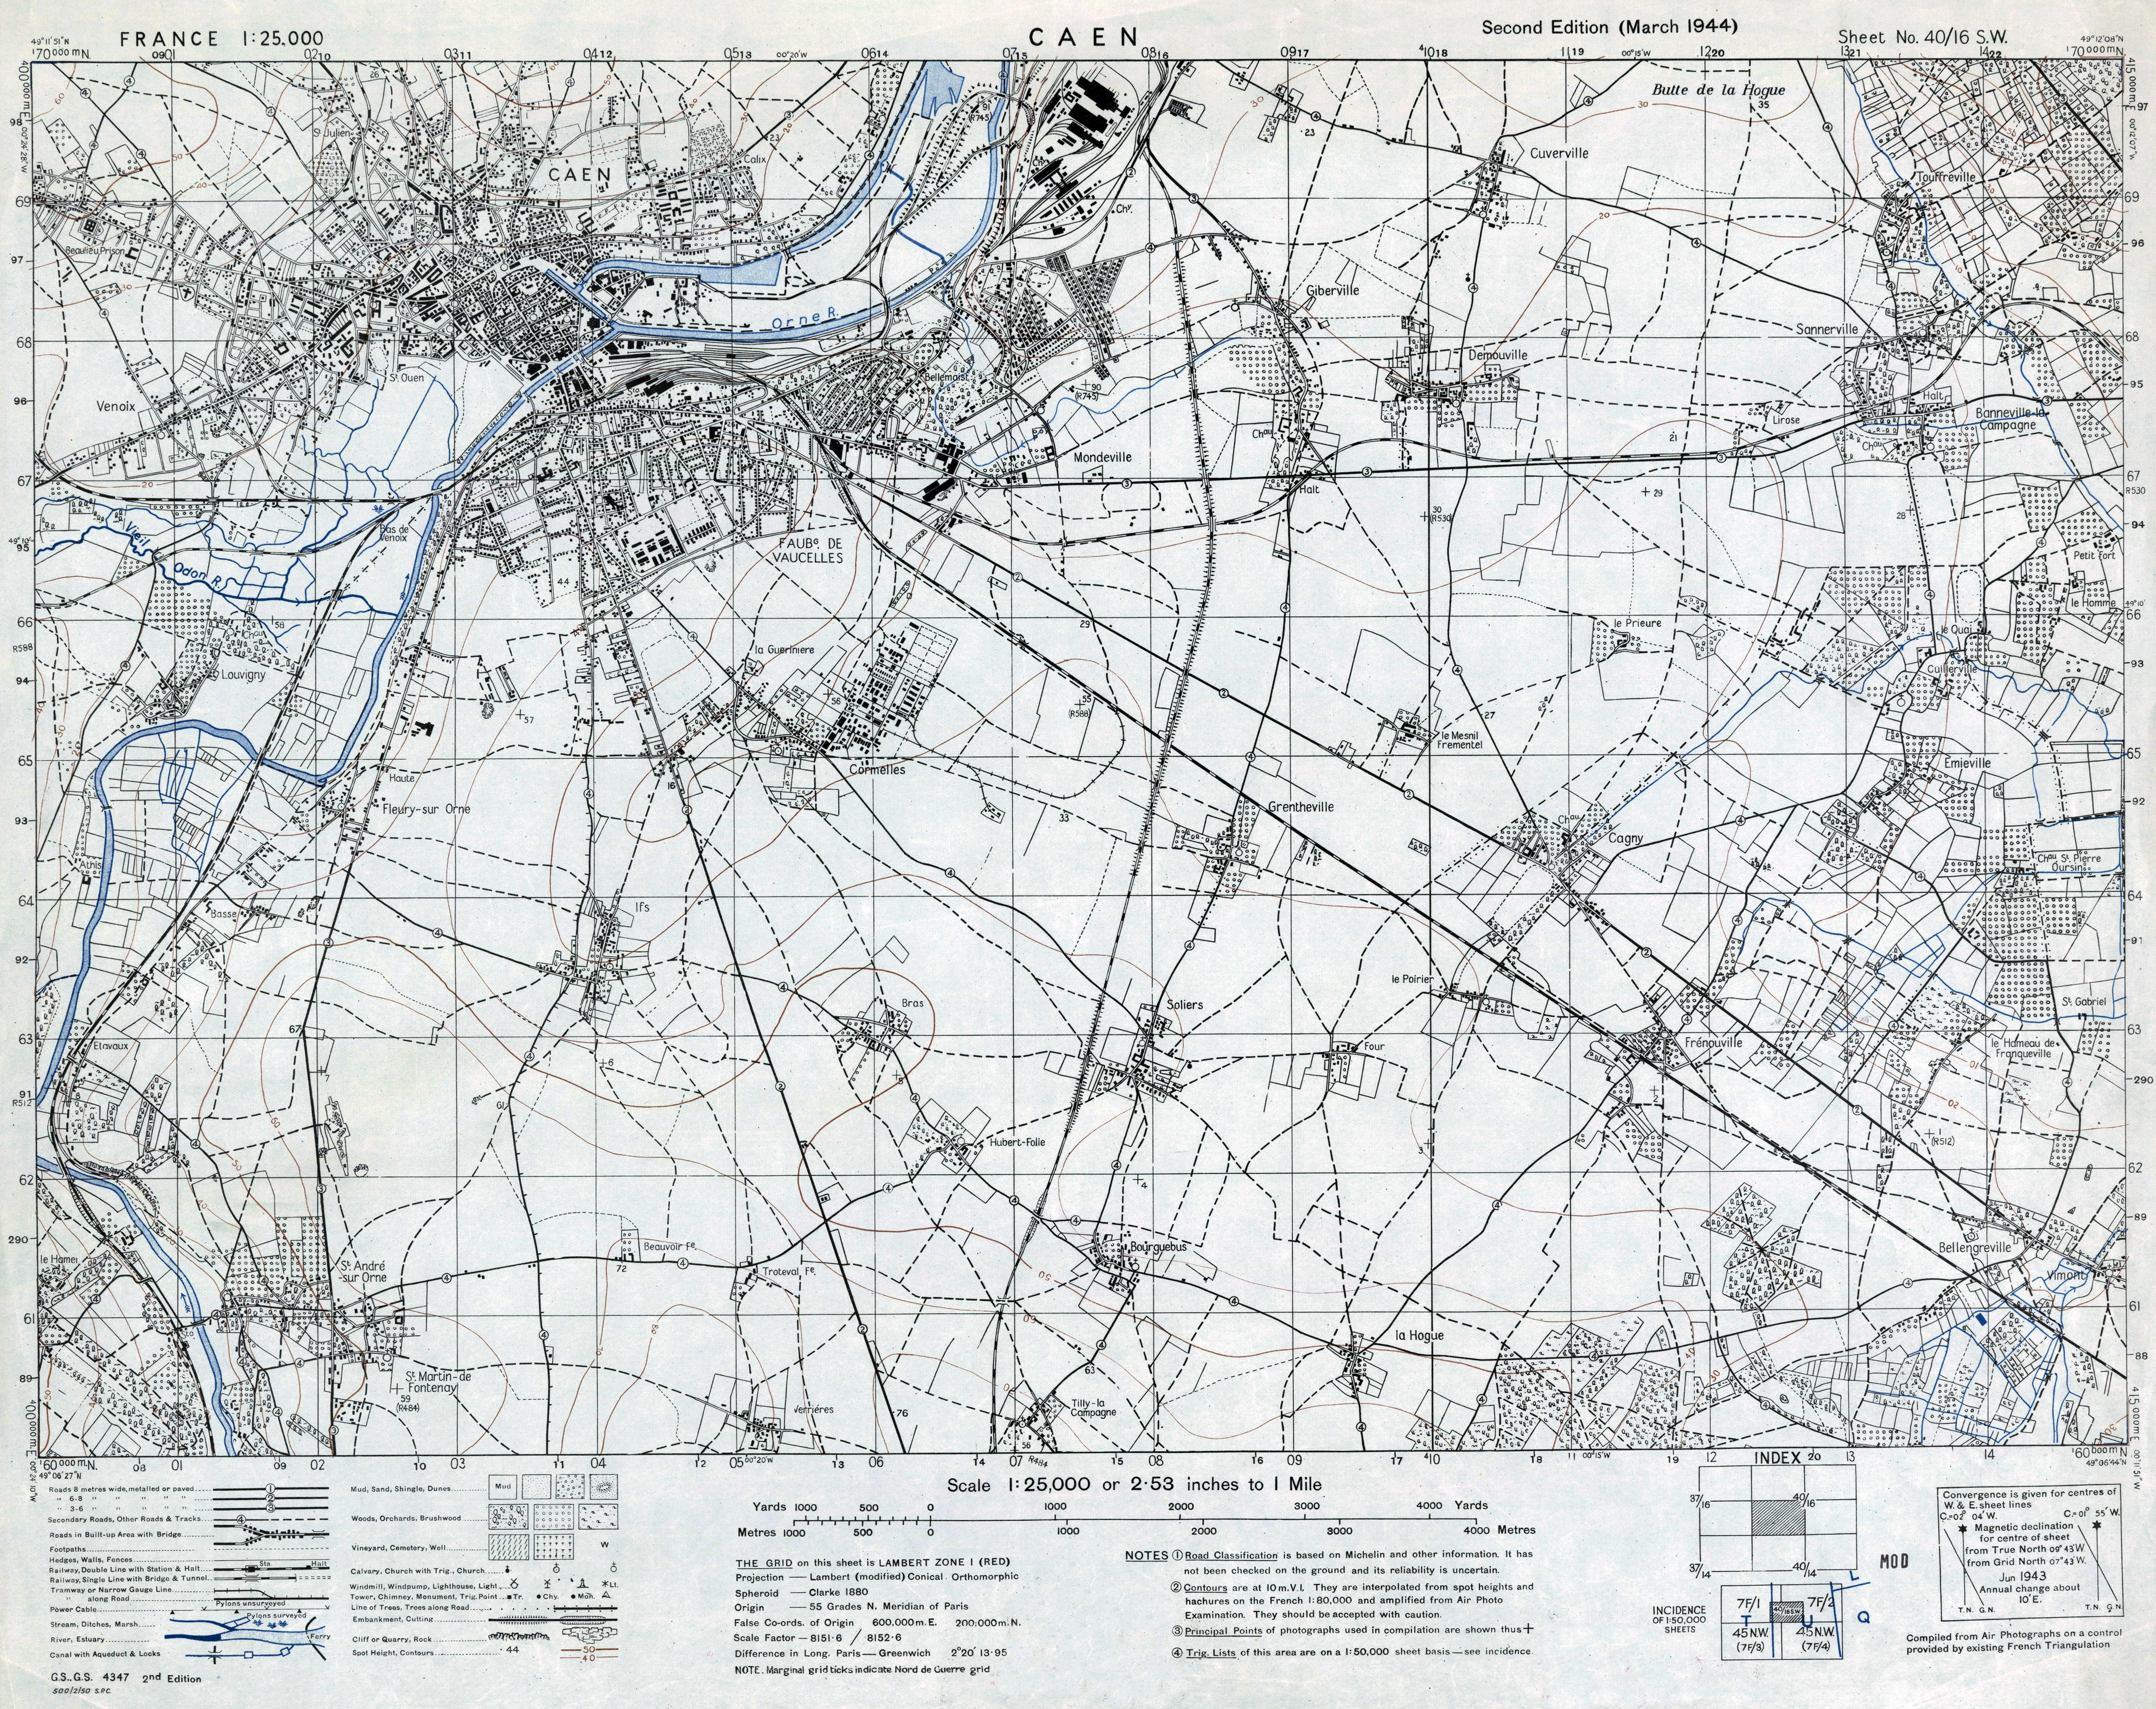 007A - GSGS-4347-Caen